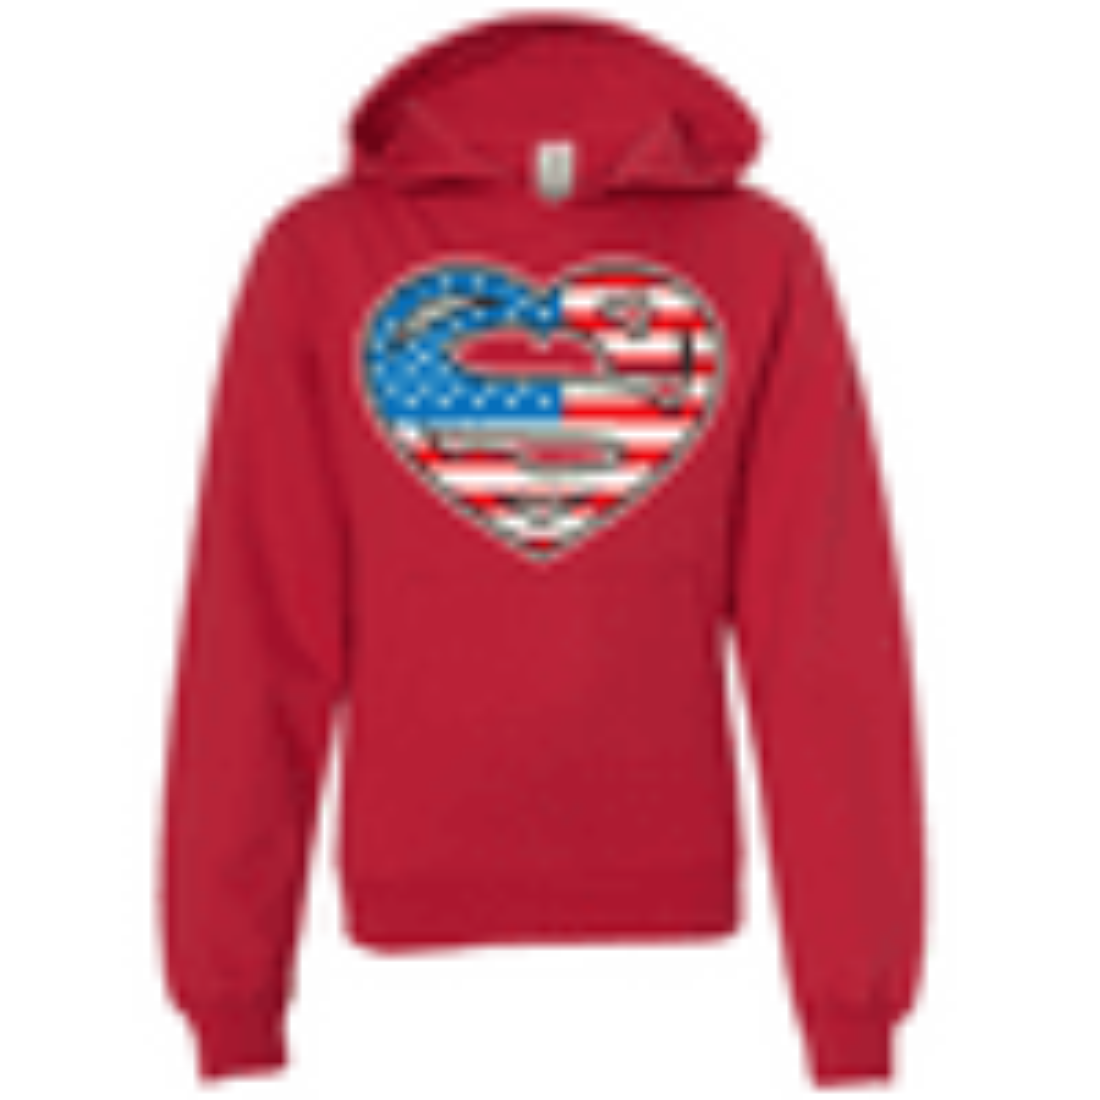 Super American Girl Heart Premium Youth Sweatshirt Hoodie dsc-SprAmcnGrlHrtPRMYTHHDY-redlrg